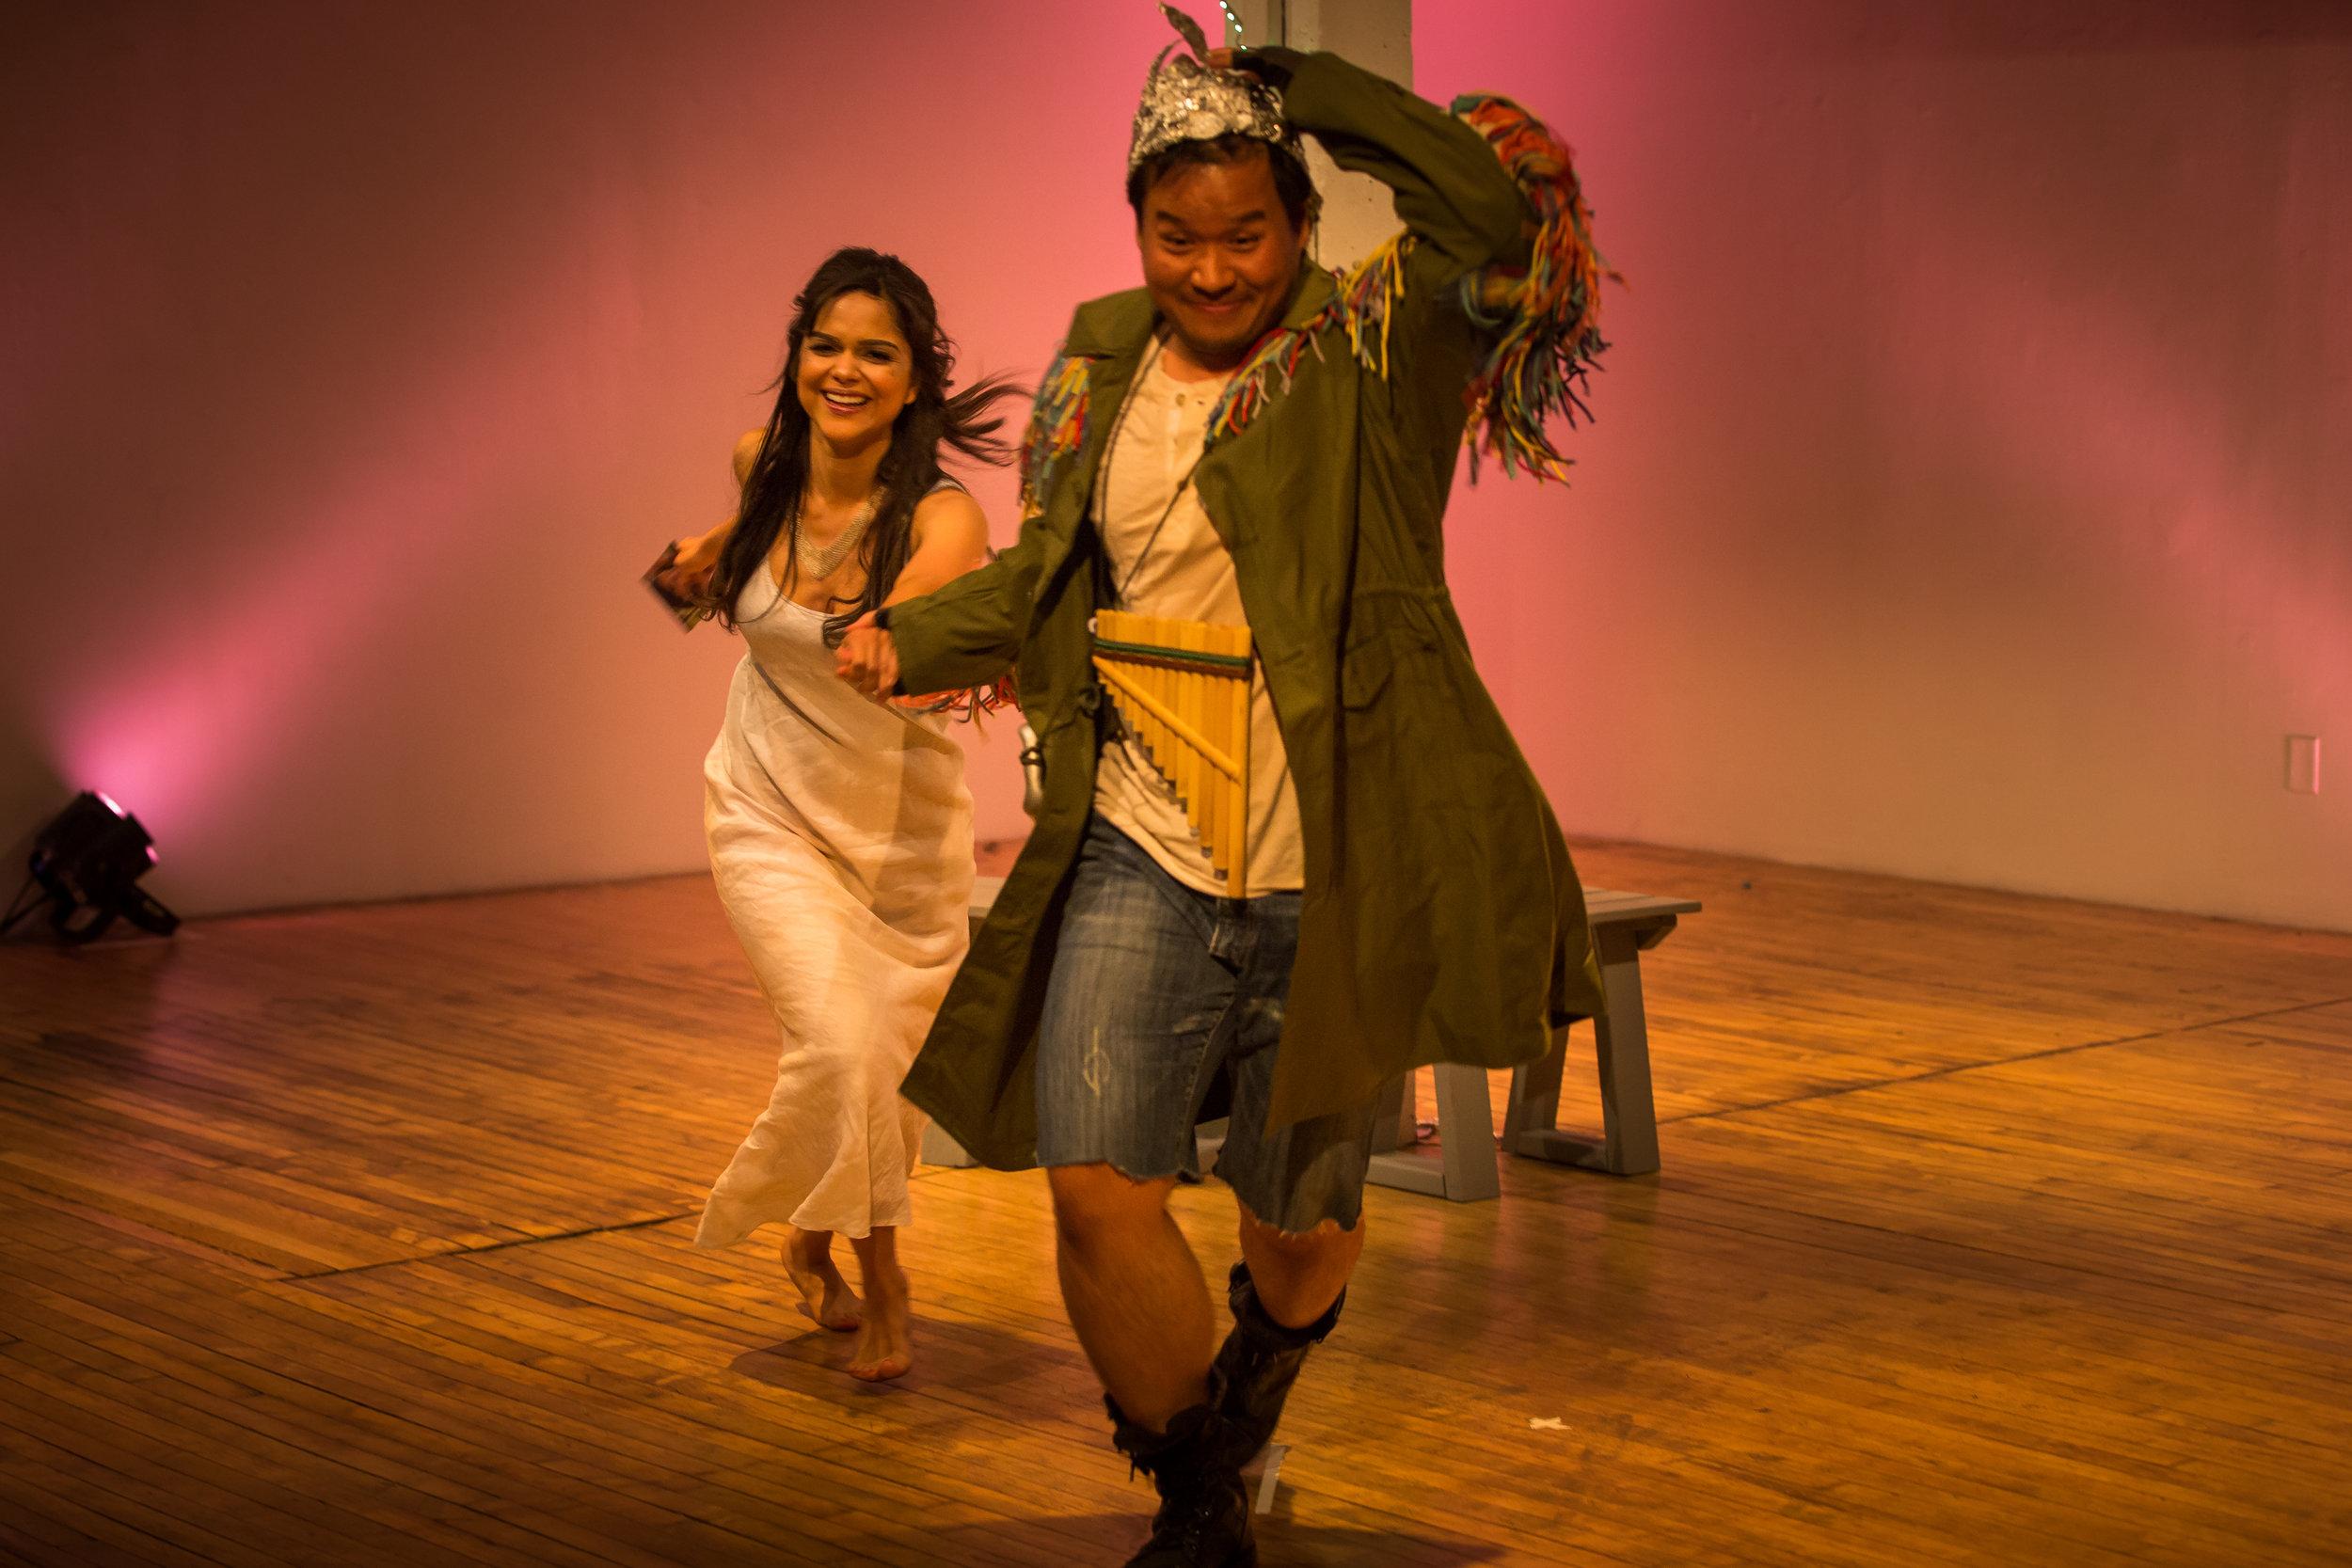 Copy of 20170530 - Bare Opera -  Mozast's The Magic Flute - Dress Rehearsal 0211.jpg